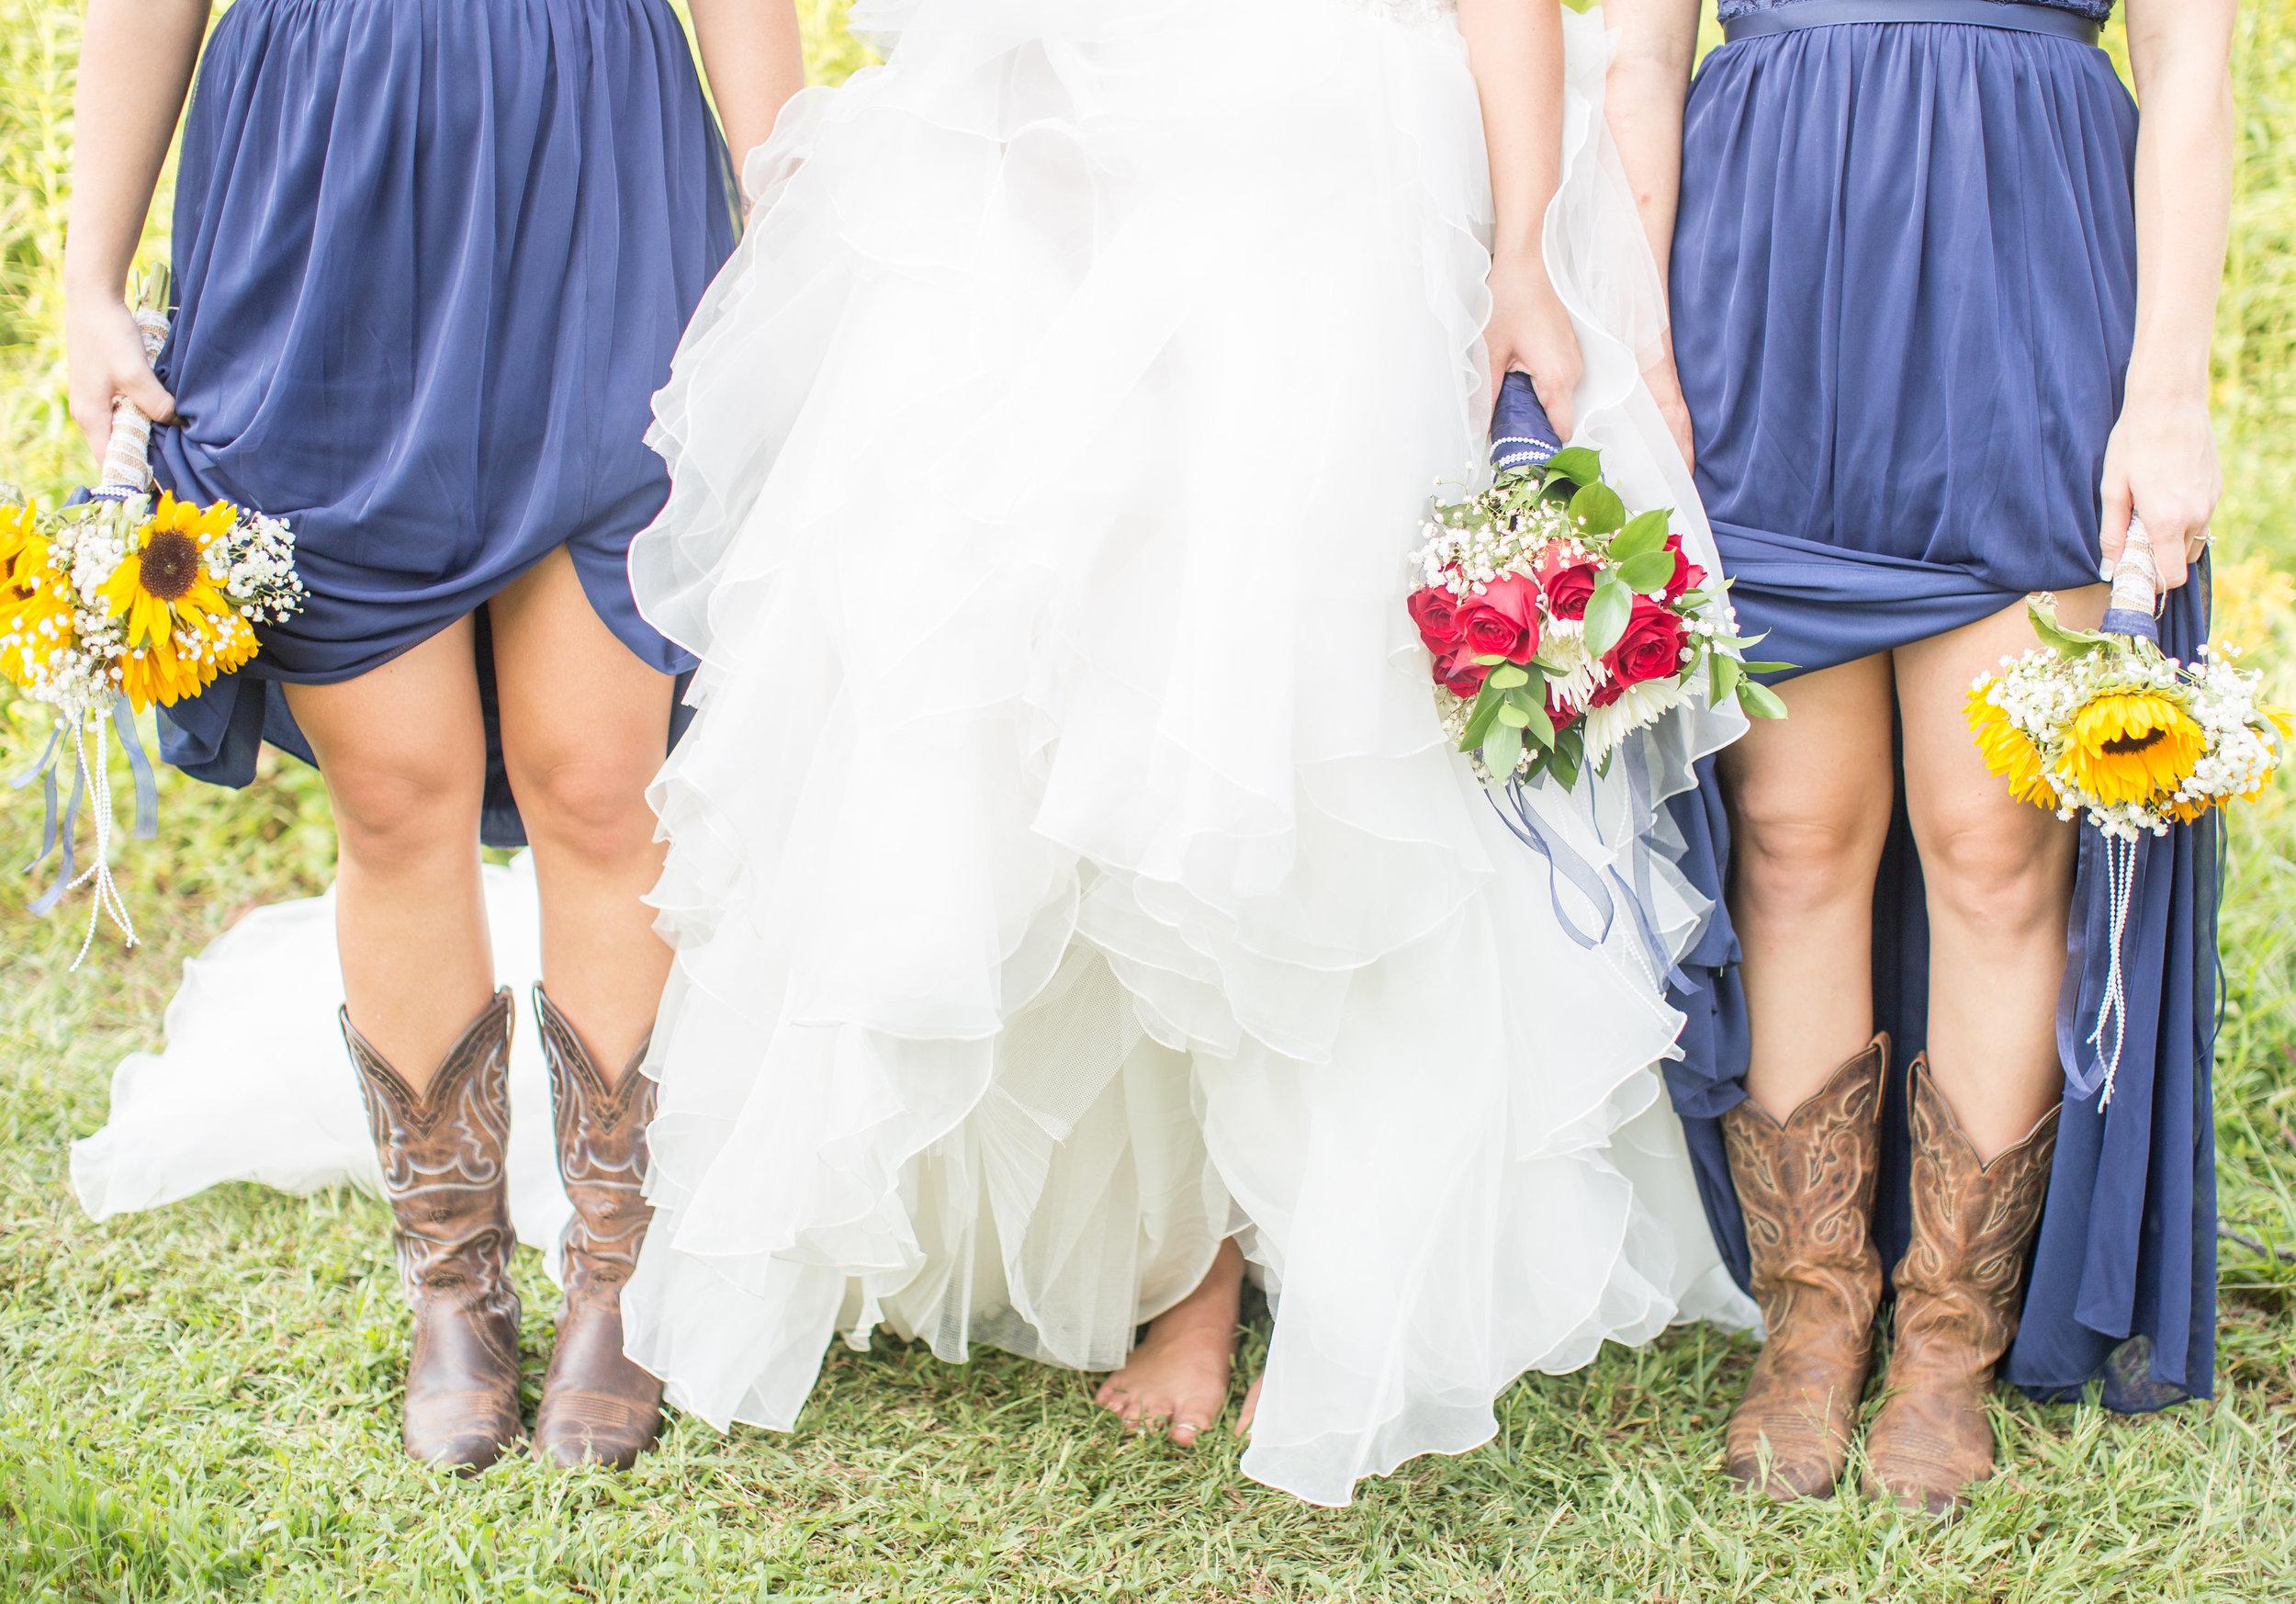 wedding-dress-boots-bride-bridesmaids-photos.jpg